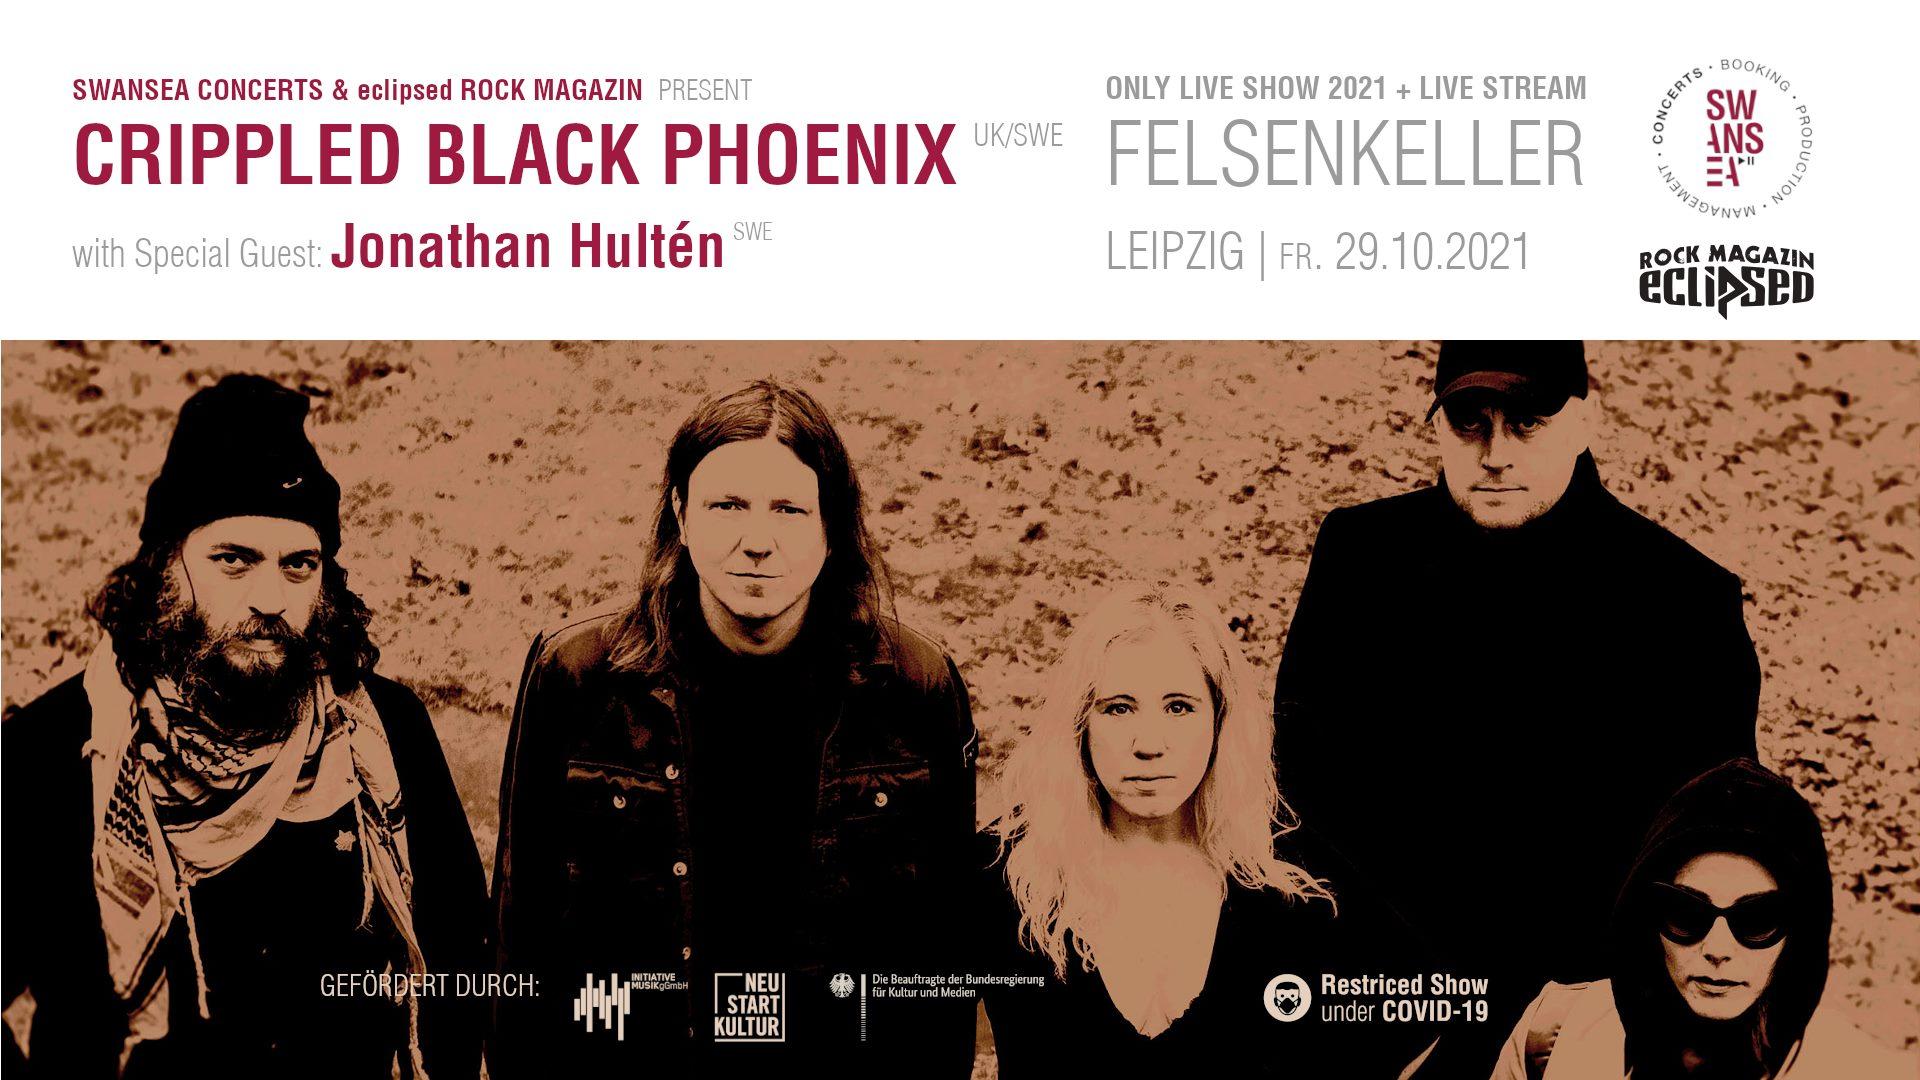 CRIPPLED BLACK PHOENIX w/ Special Guest: Jonathan Hultén